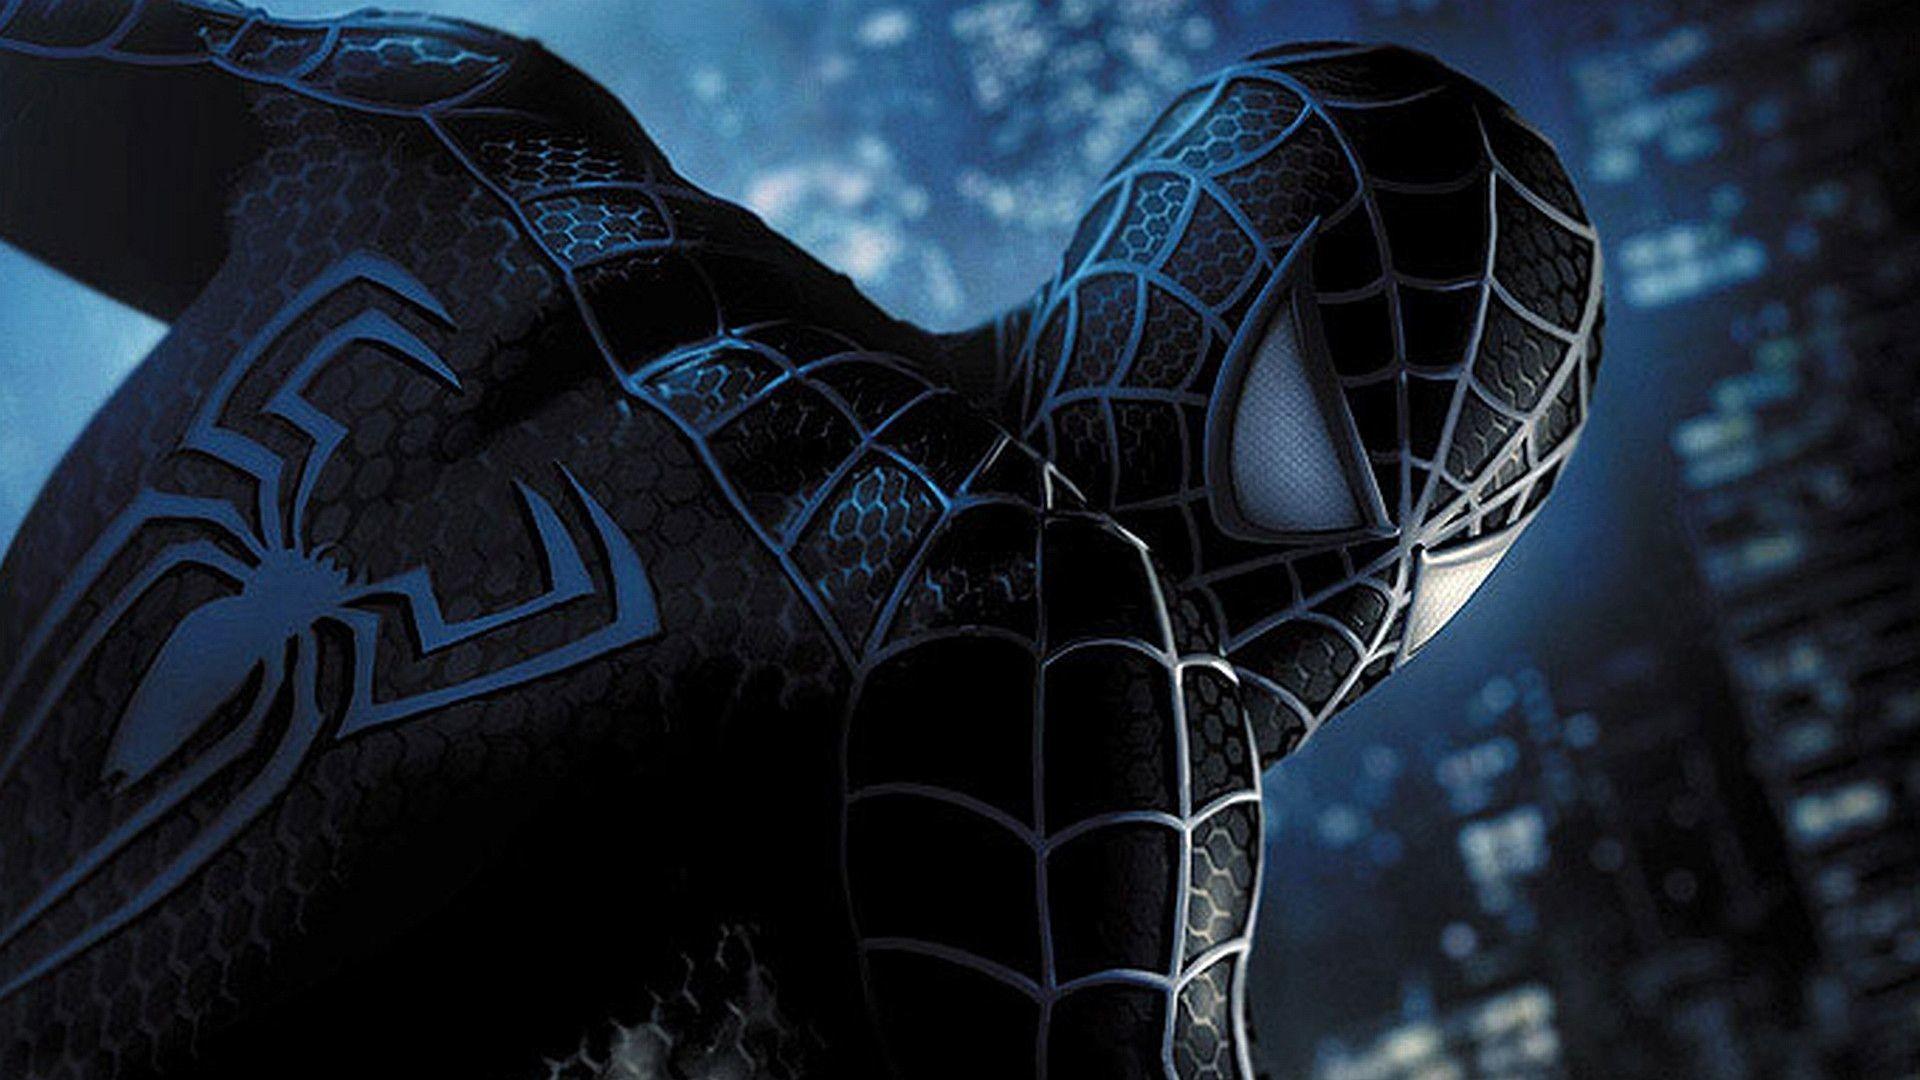 Hd Spider Man Wallpaper, Superhero, Hollywood, Movie Charactrer, Stanlee,  Team Cap